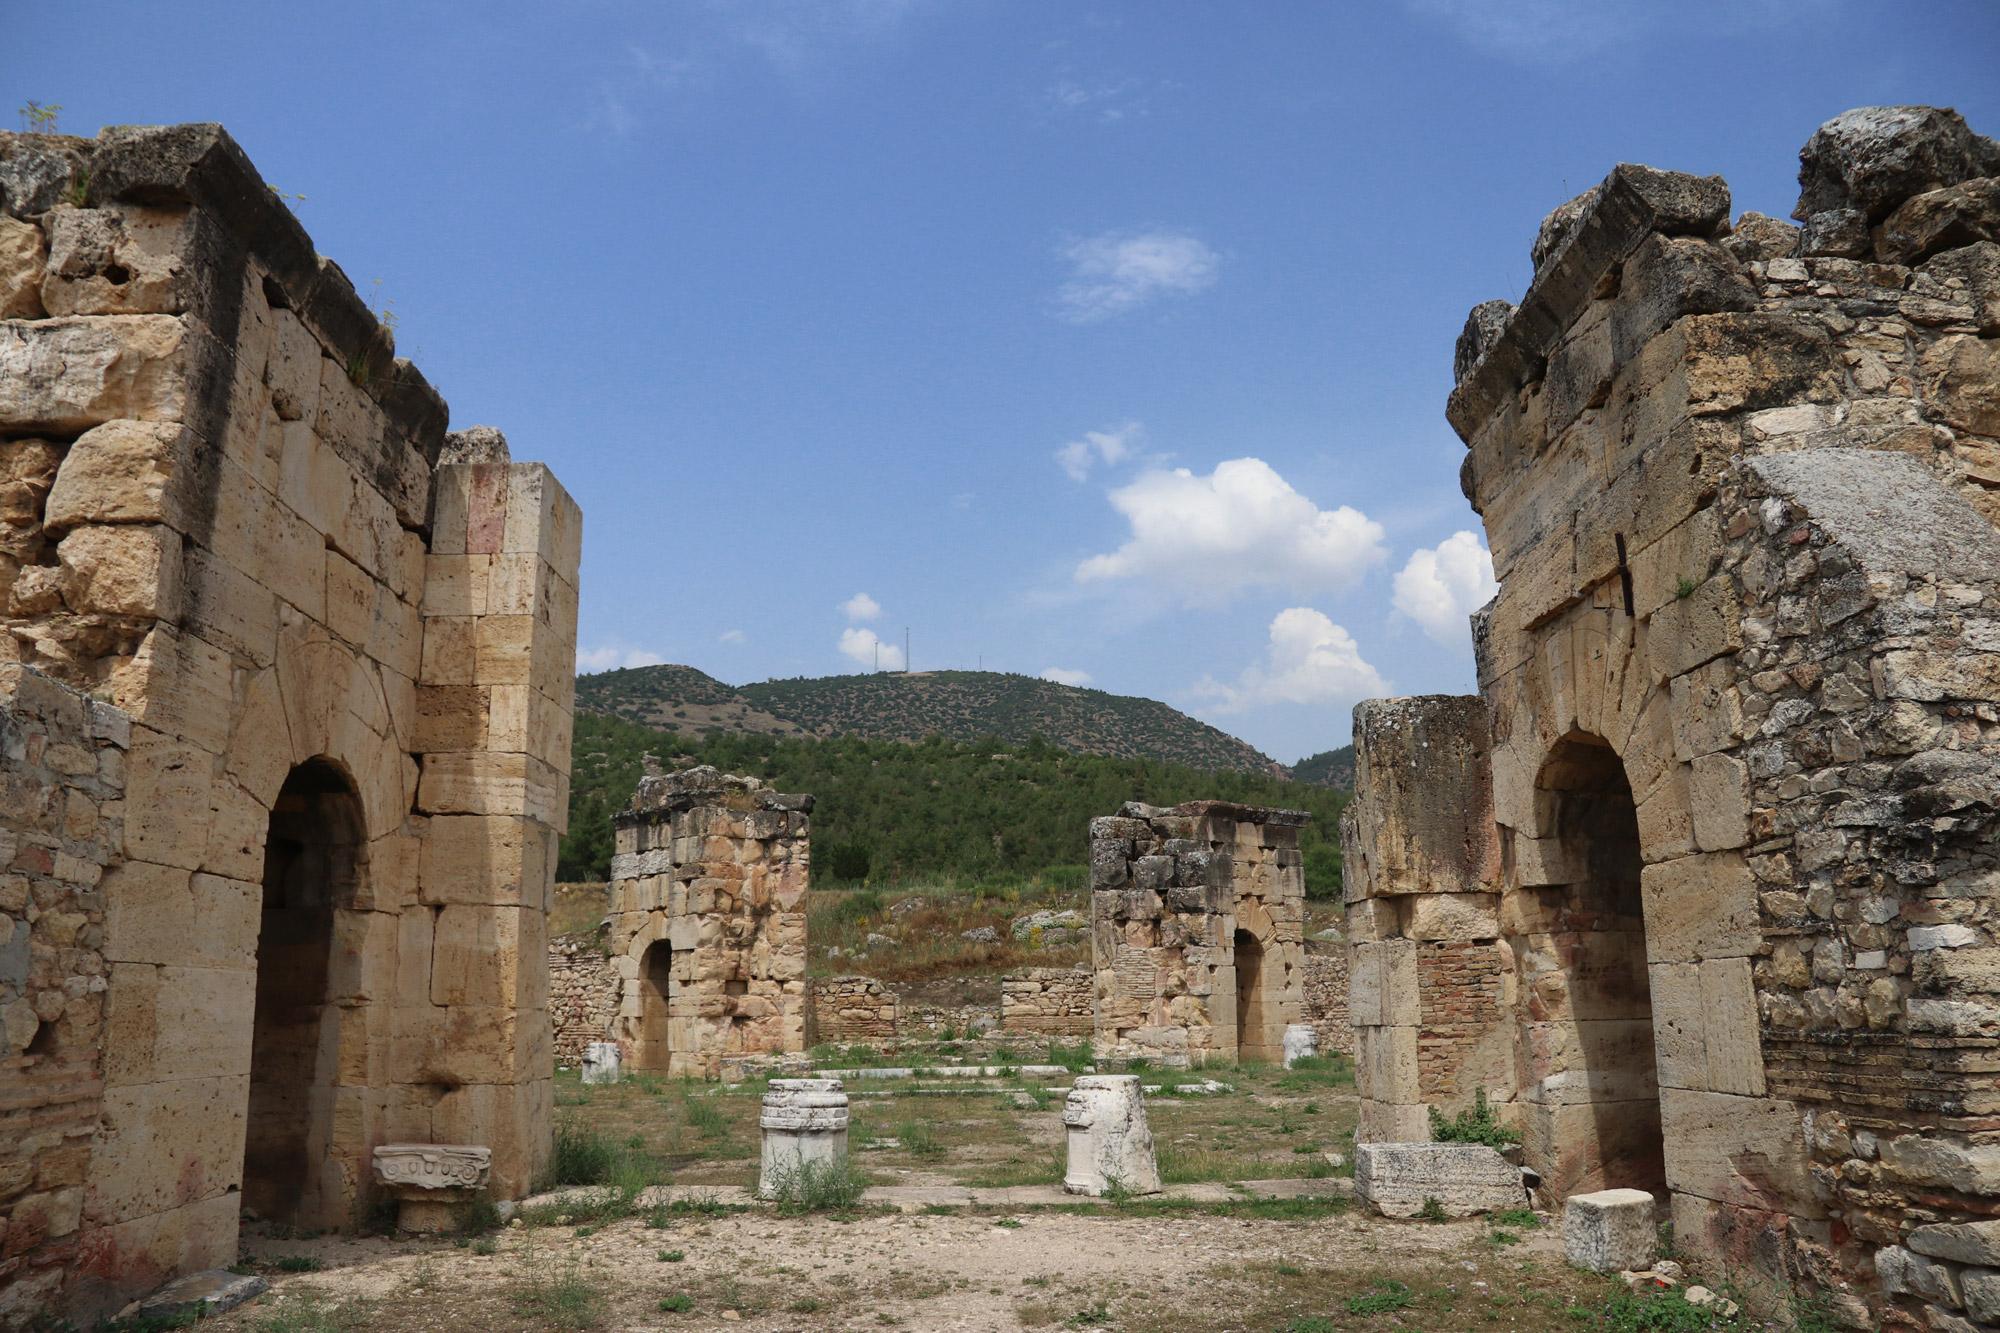 Turkije reisverslag: Pamukkale en Hiërapolis - Martyrium van Filippus